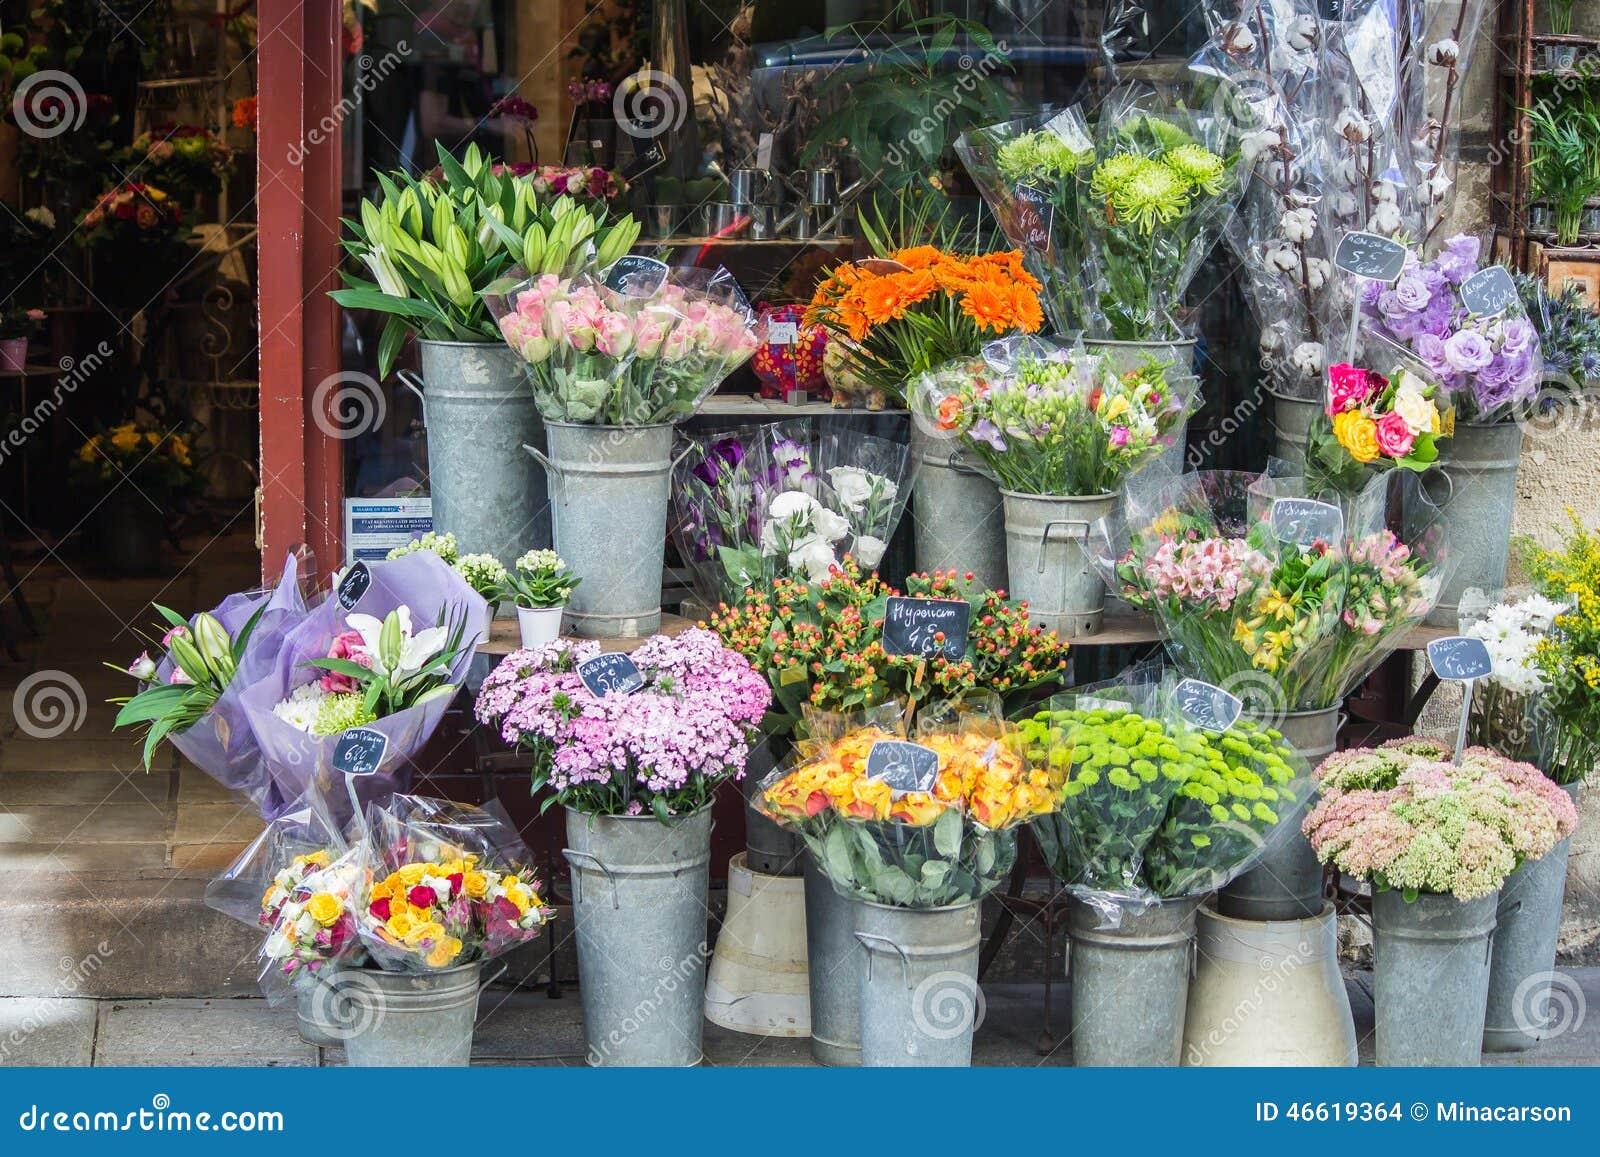 Colorful Bouquets In Front Of Flower Shop Paris France